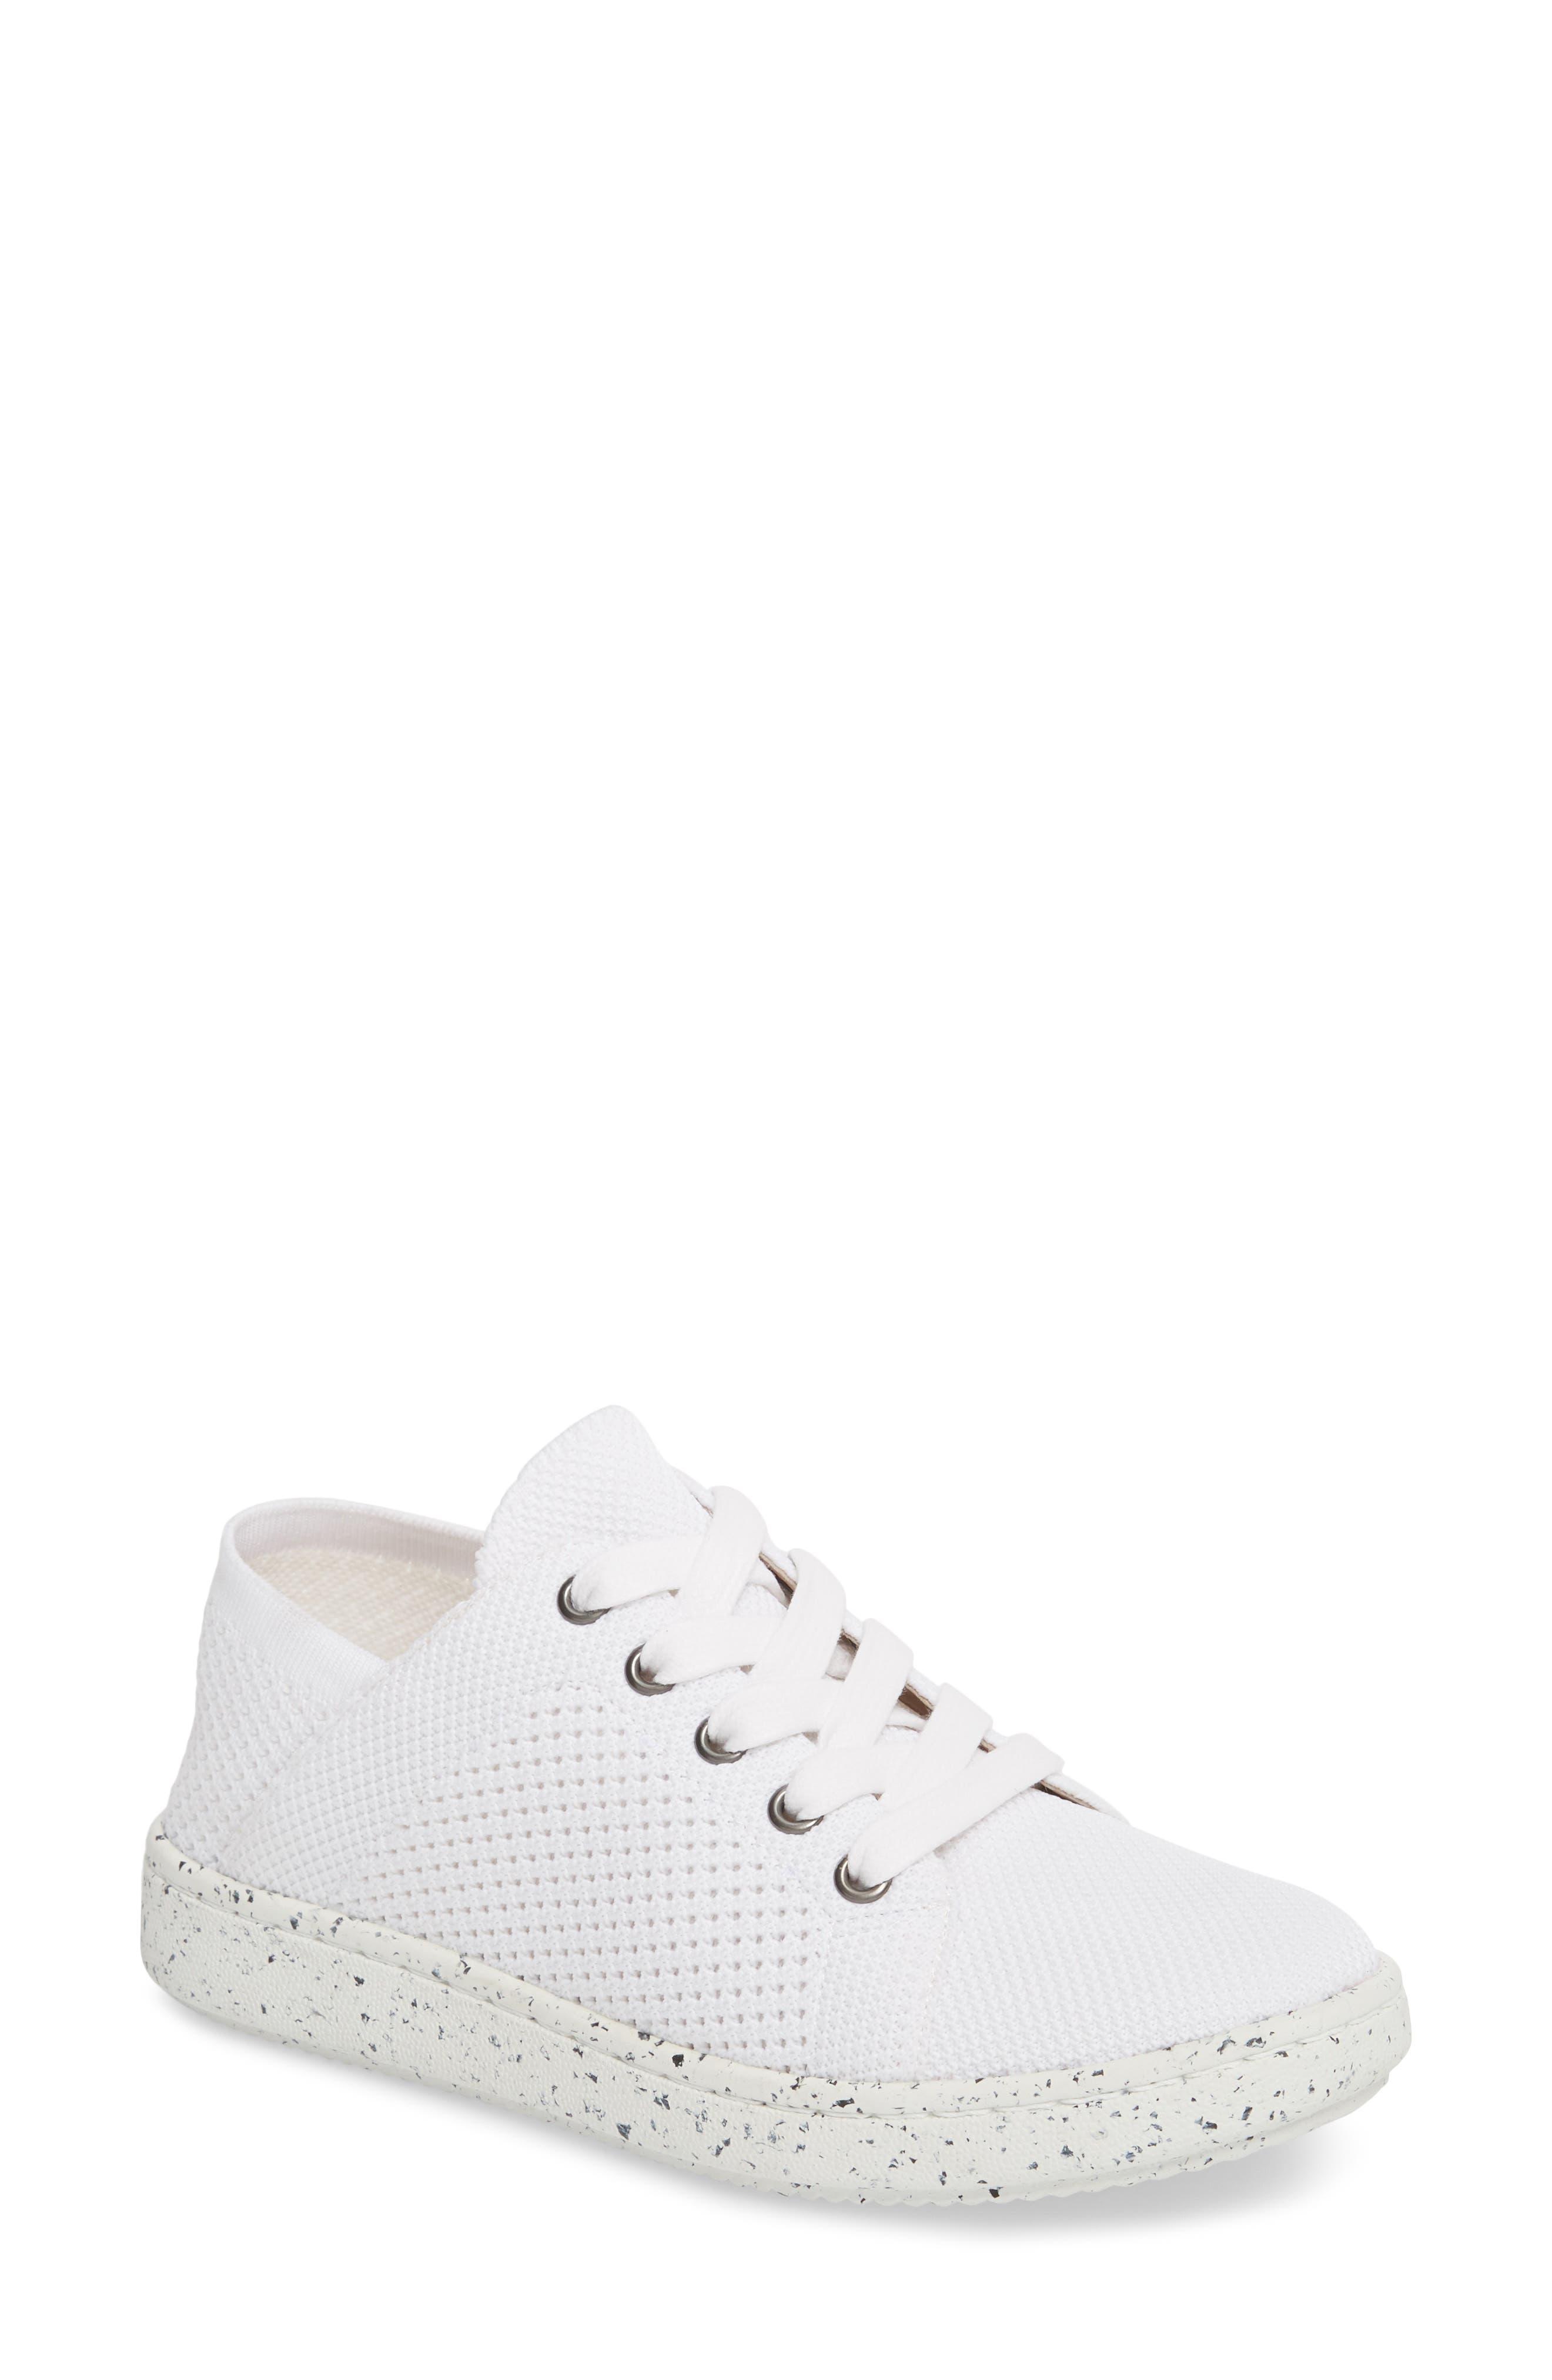 Clifton Sneaker,                             Main thumbnail 1, color,                             White Fabric